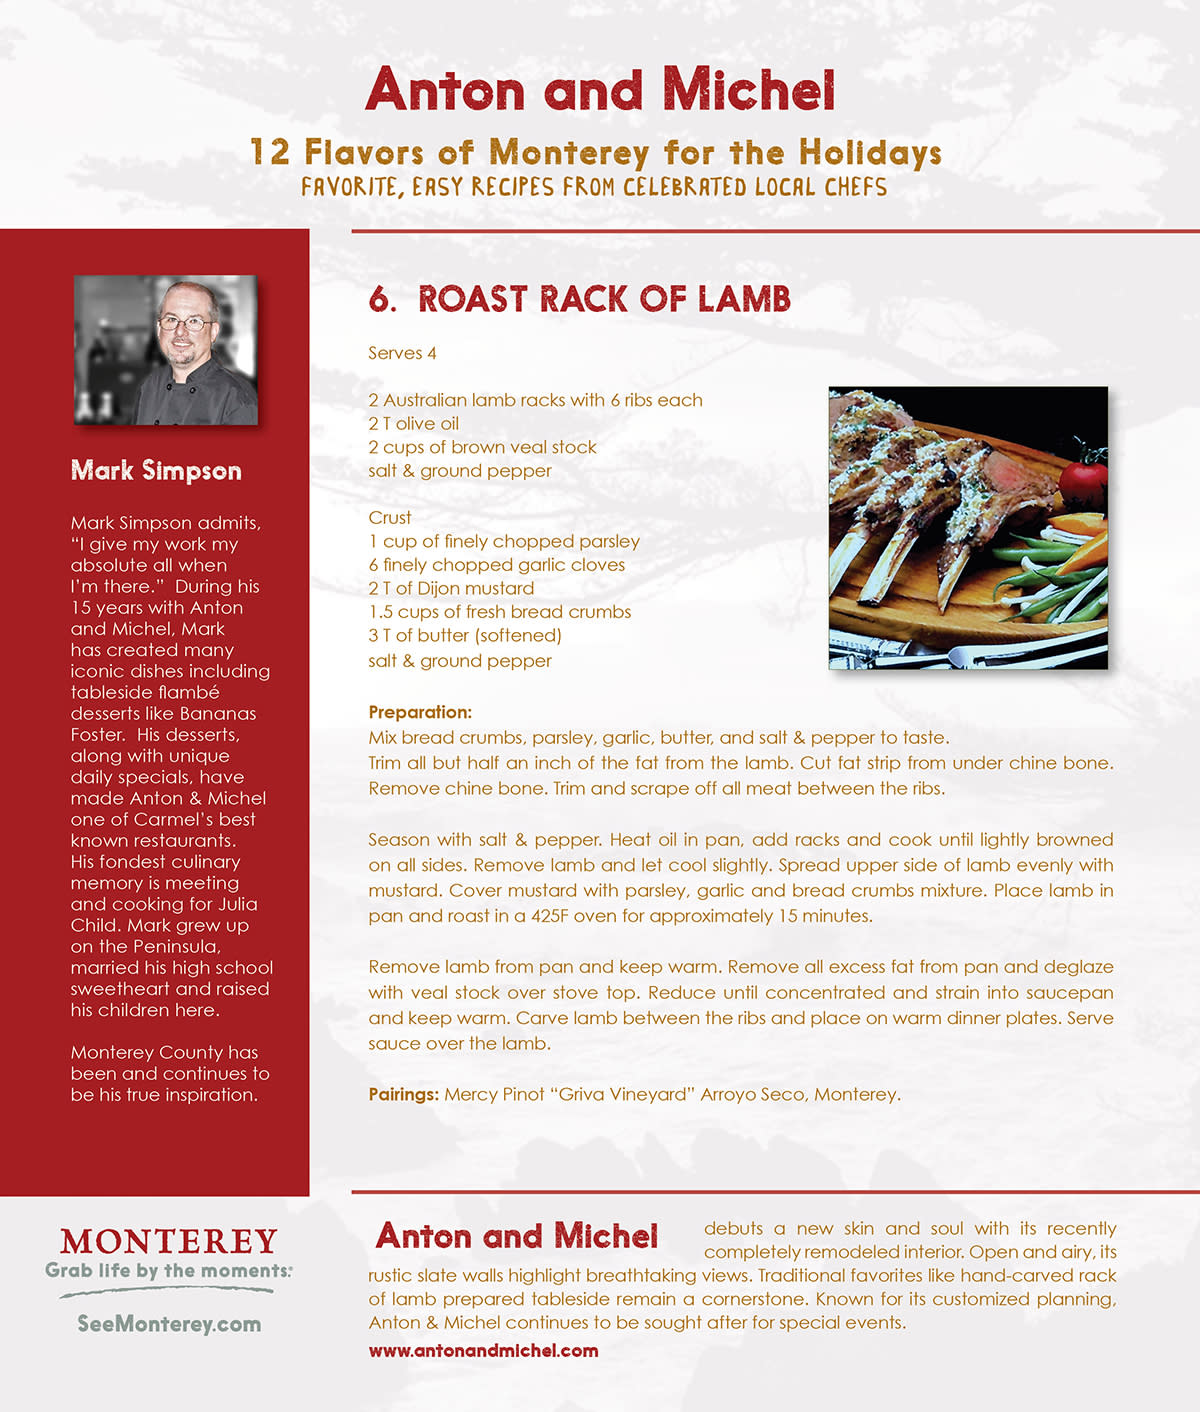 12 Flavors of Monterey- Day 6: Anton & Michel